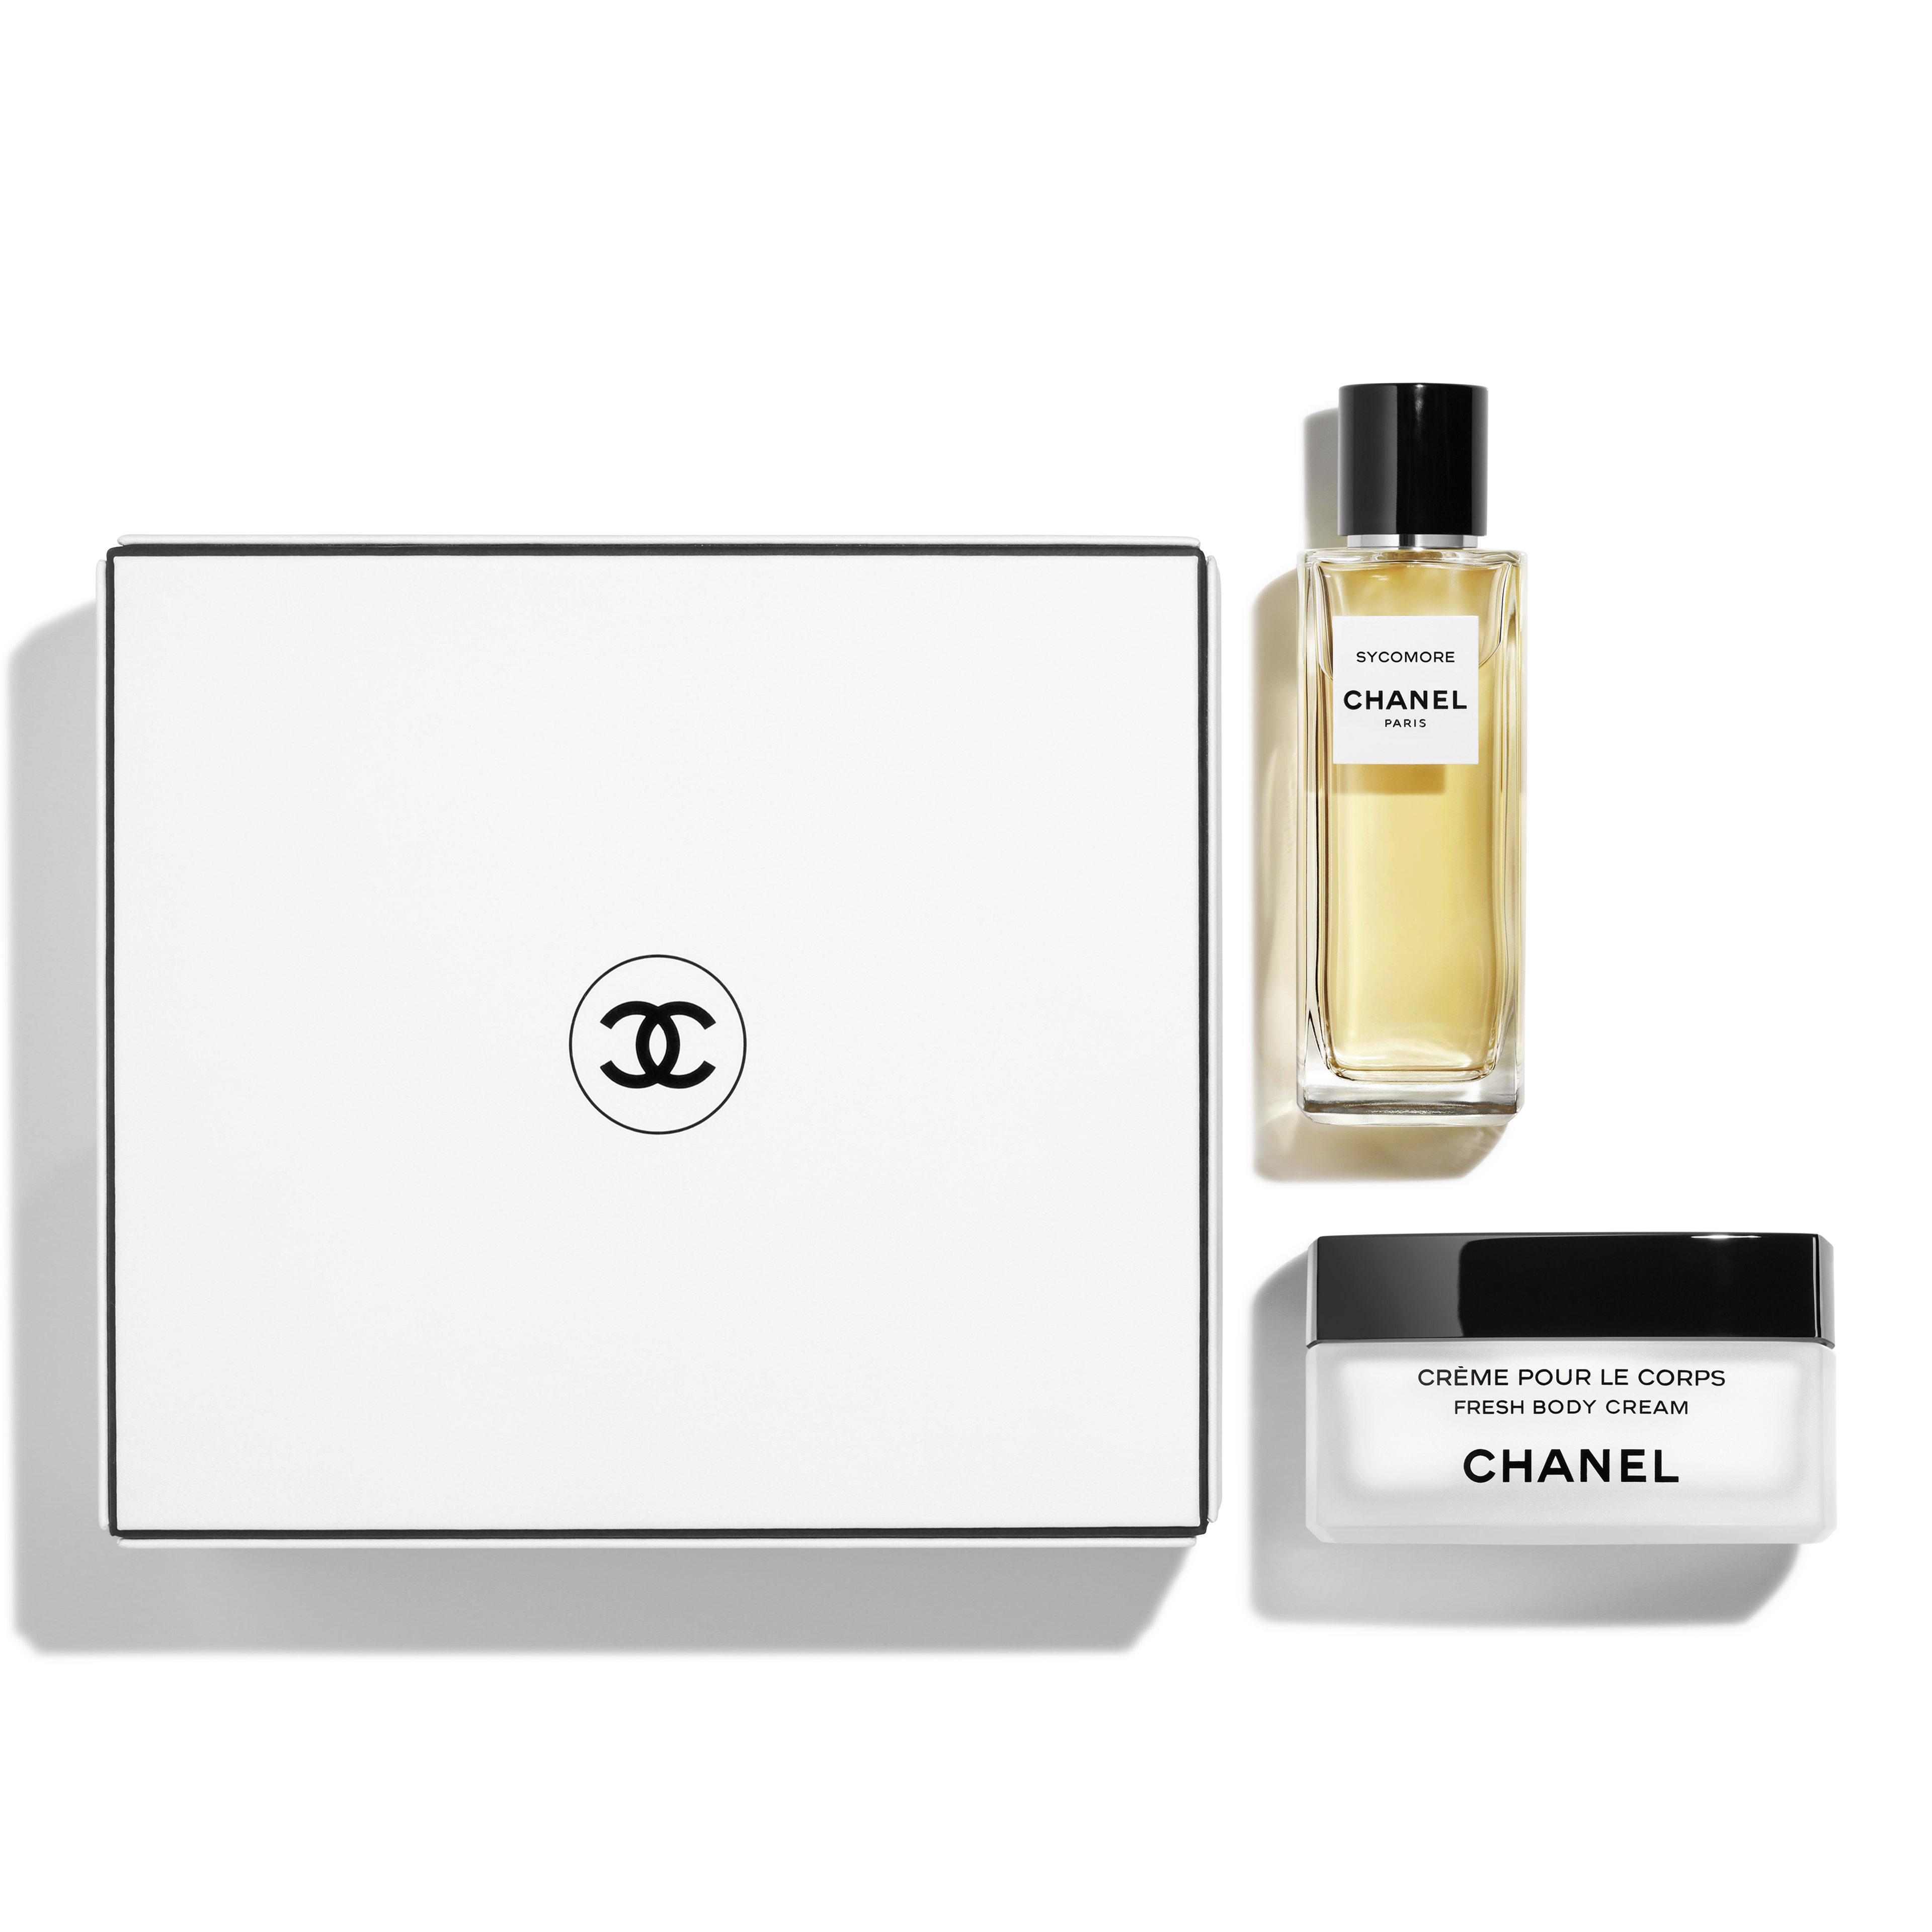 SYCOMORE - fragrance - 1Piece - Default view